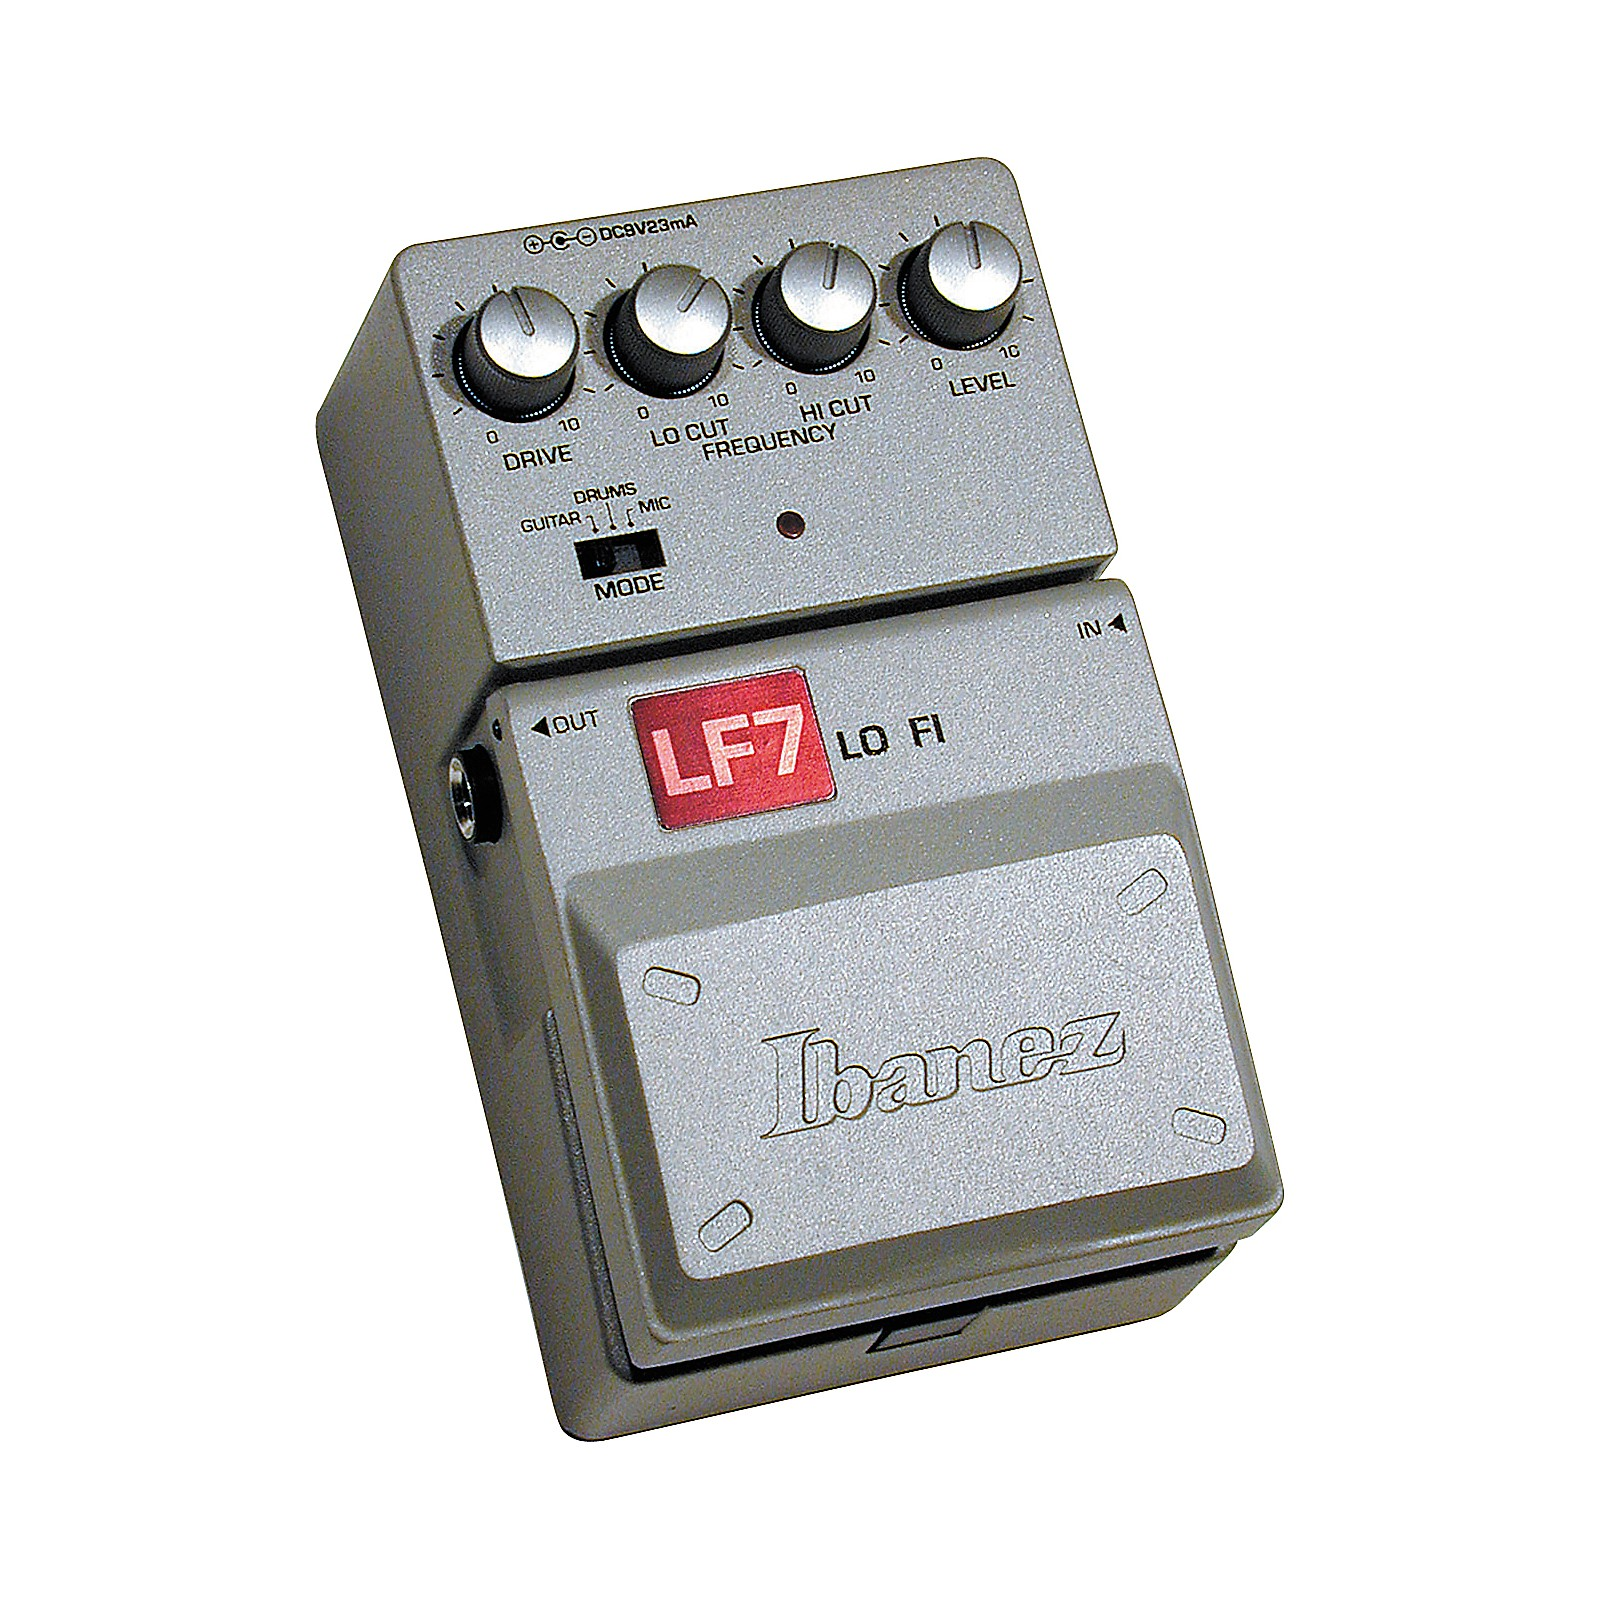 Ibanez Tone-Lok LF7 Lo-Fi Filter Pedal